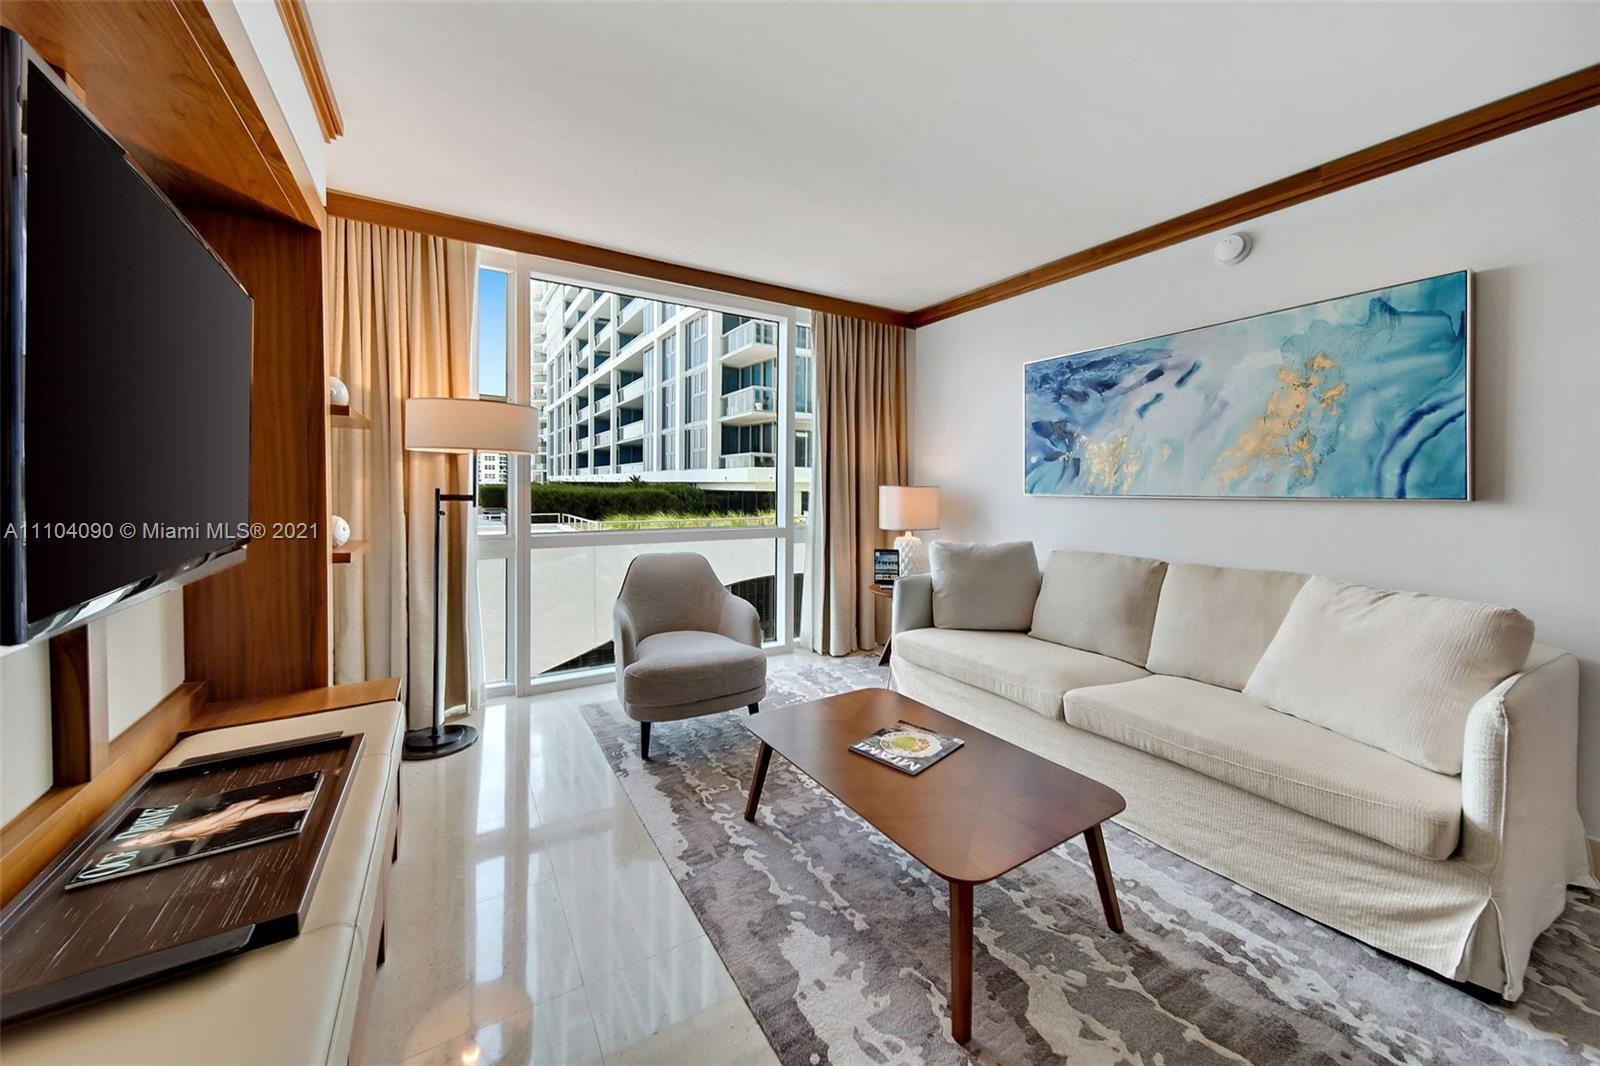 Fabulous designer turn-key 2 bedroom, 2 bathroom split floor plan at the exclusive Carillon Wellness